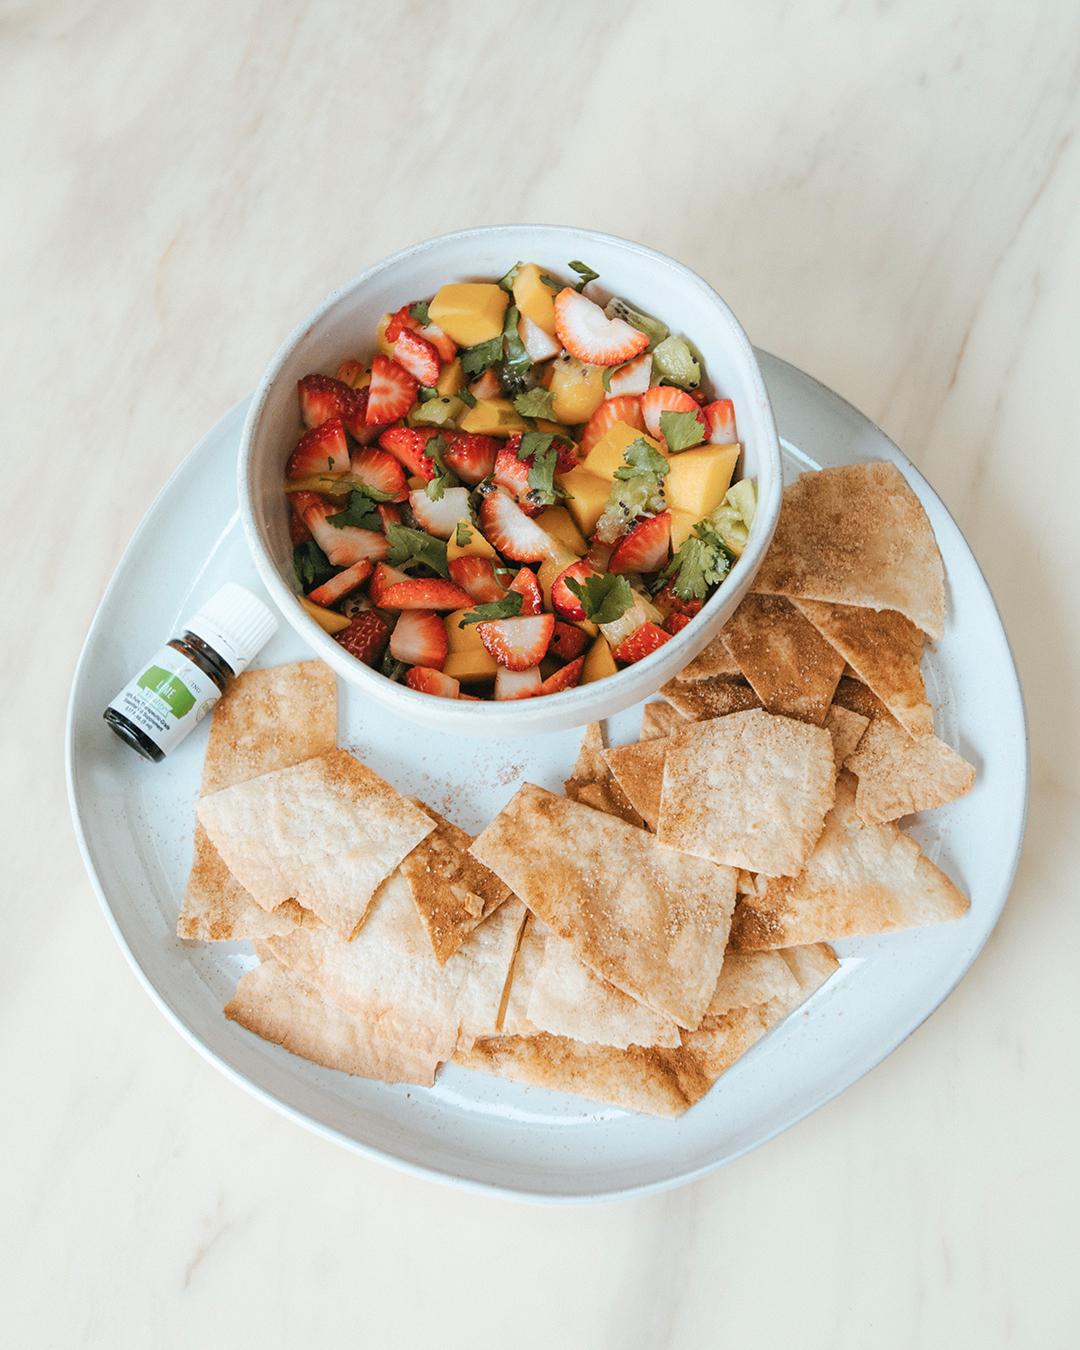 The-Oily-Home-Companion-Recipe-Mango-Strawberry-Kiwi-Fruit-Salad-Salsa-Cinnamon-Lime-Chips-Tortilla-Gluten-Free-Snack-Spring-Summer2.jpg